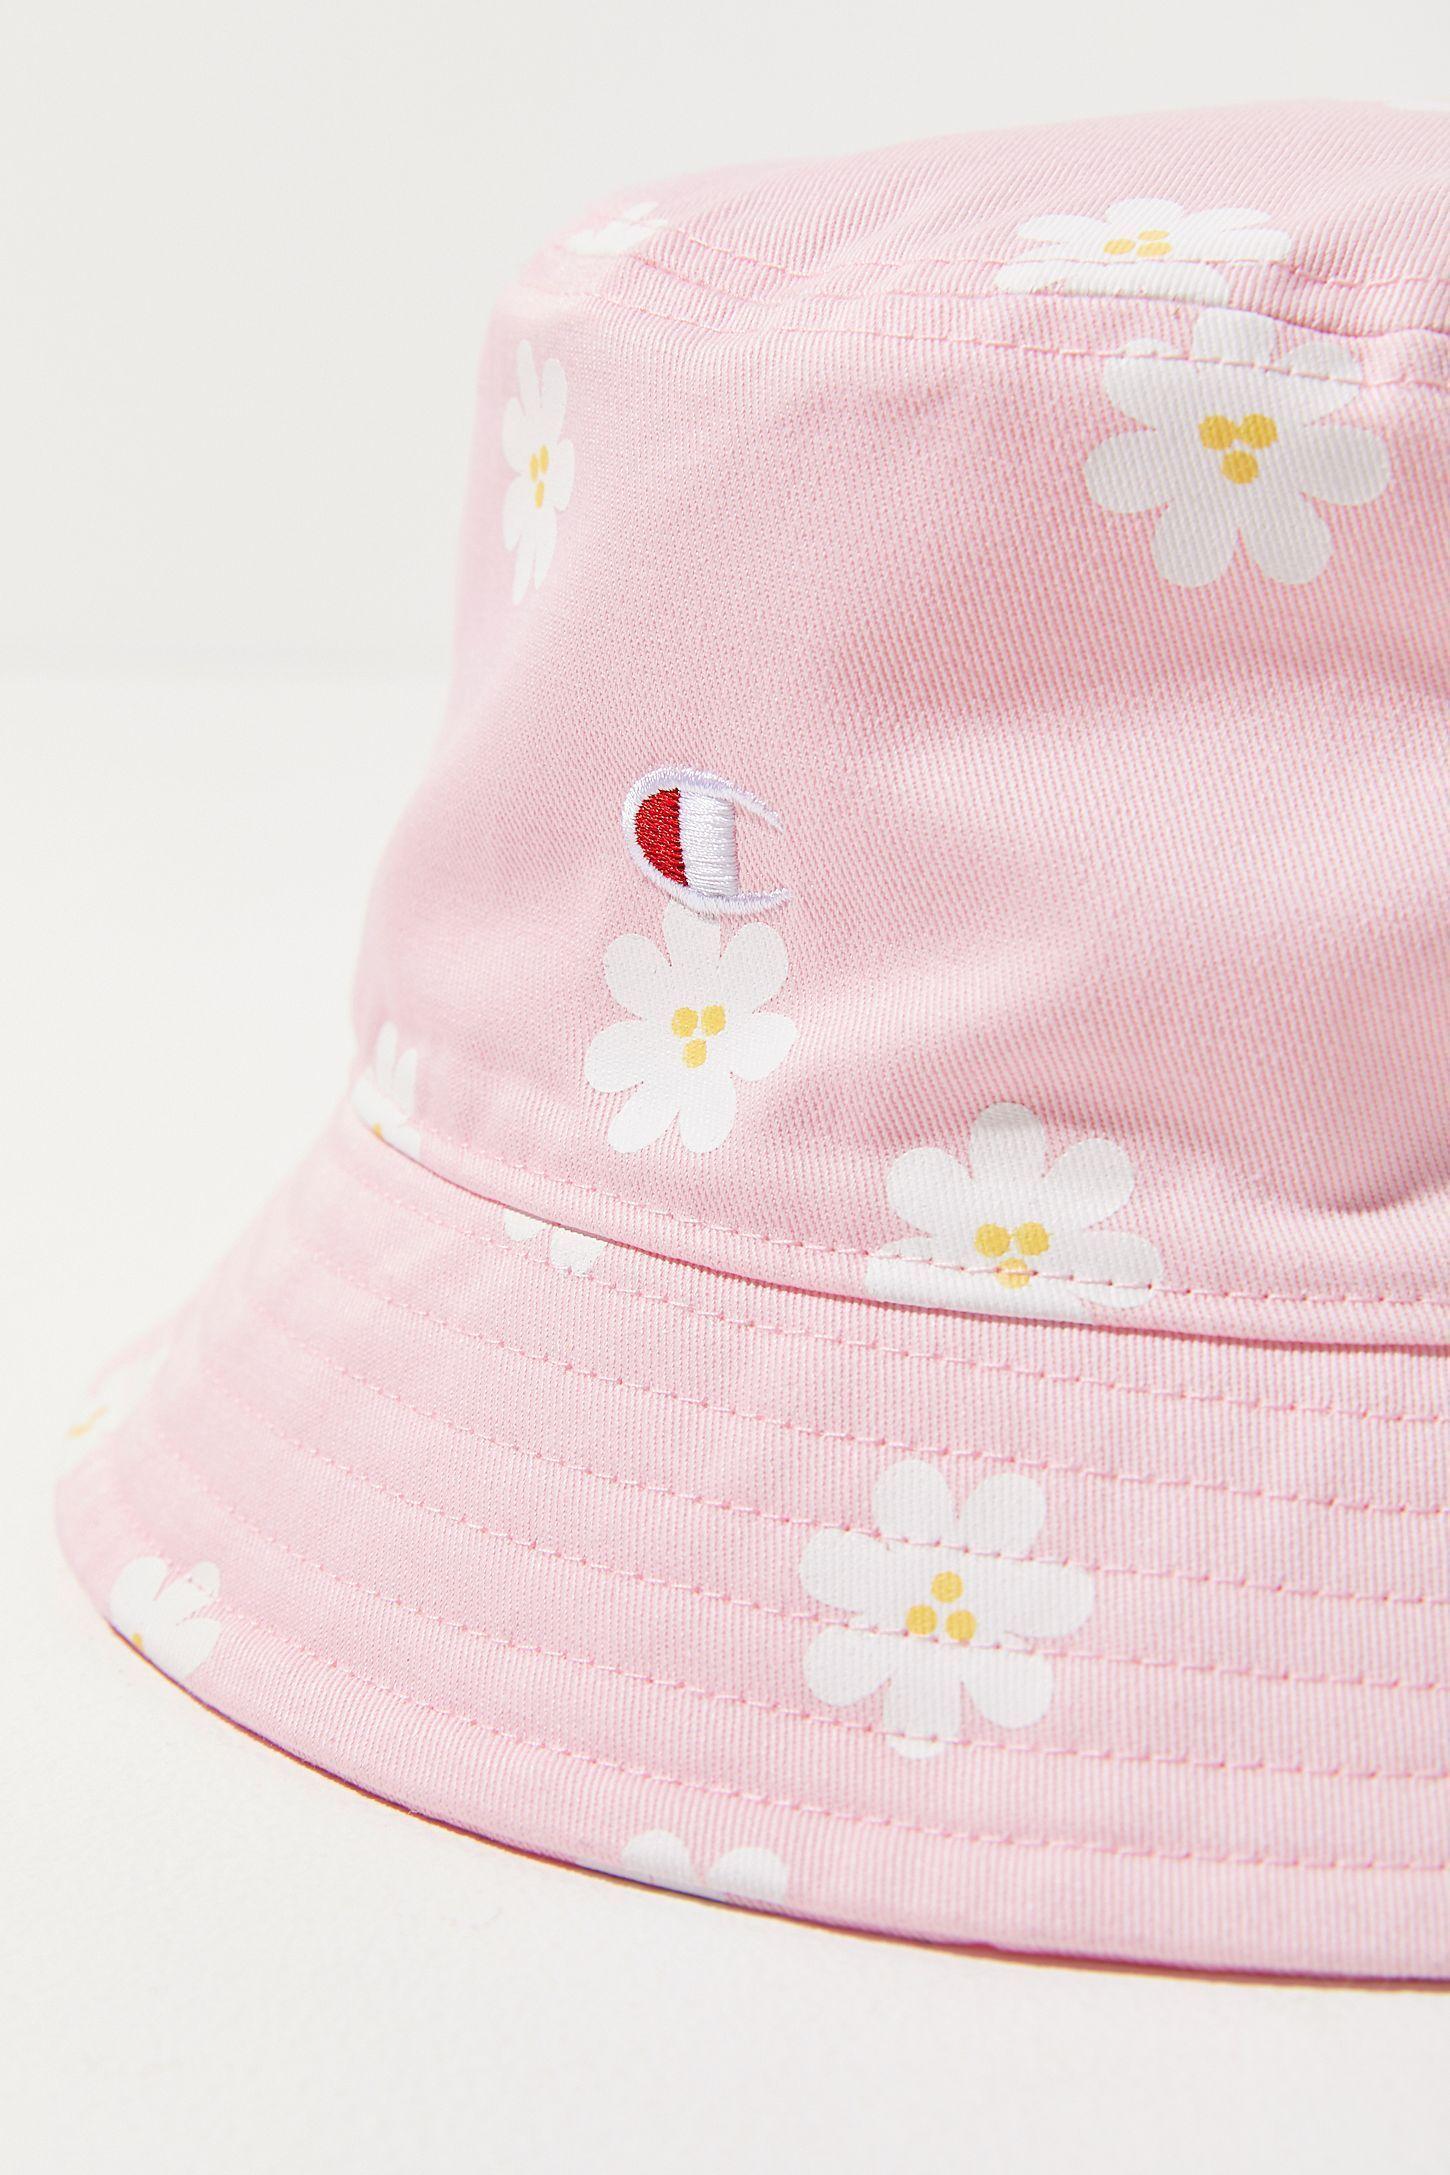 Cute Aesthetic Bucket Hats